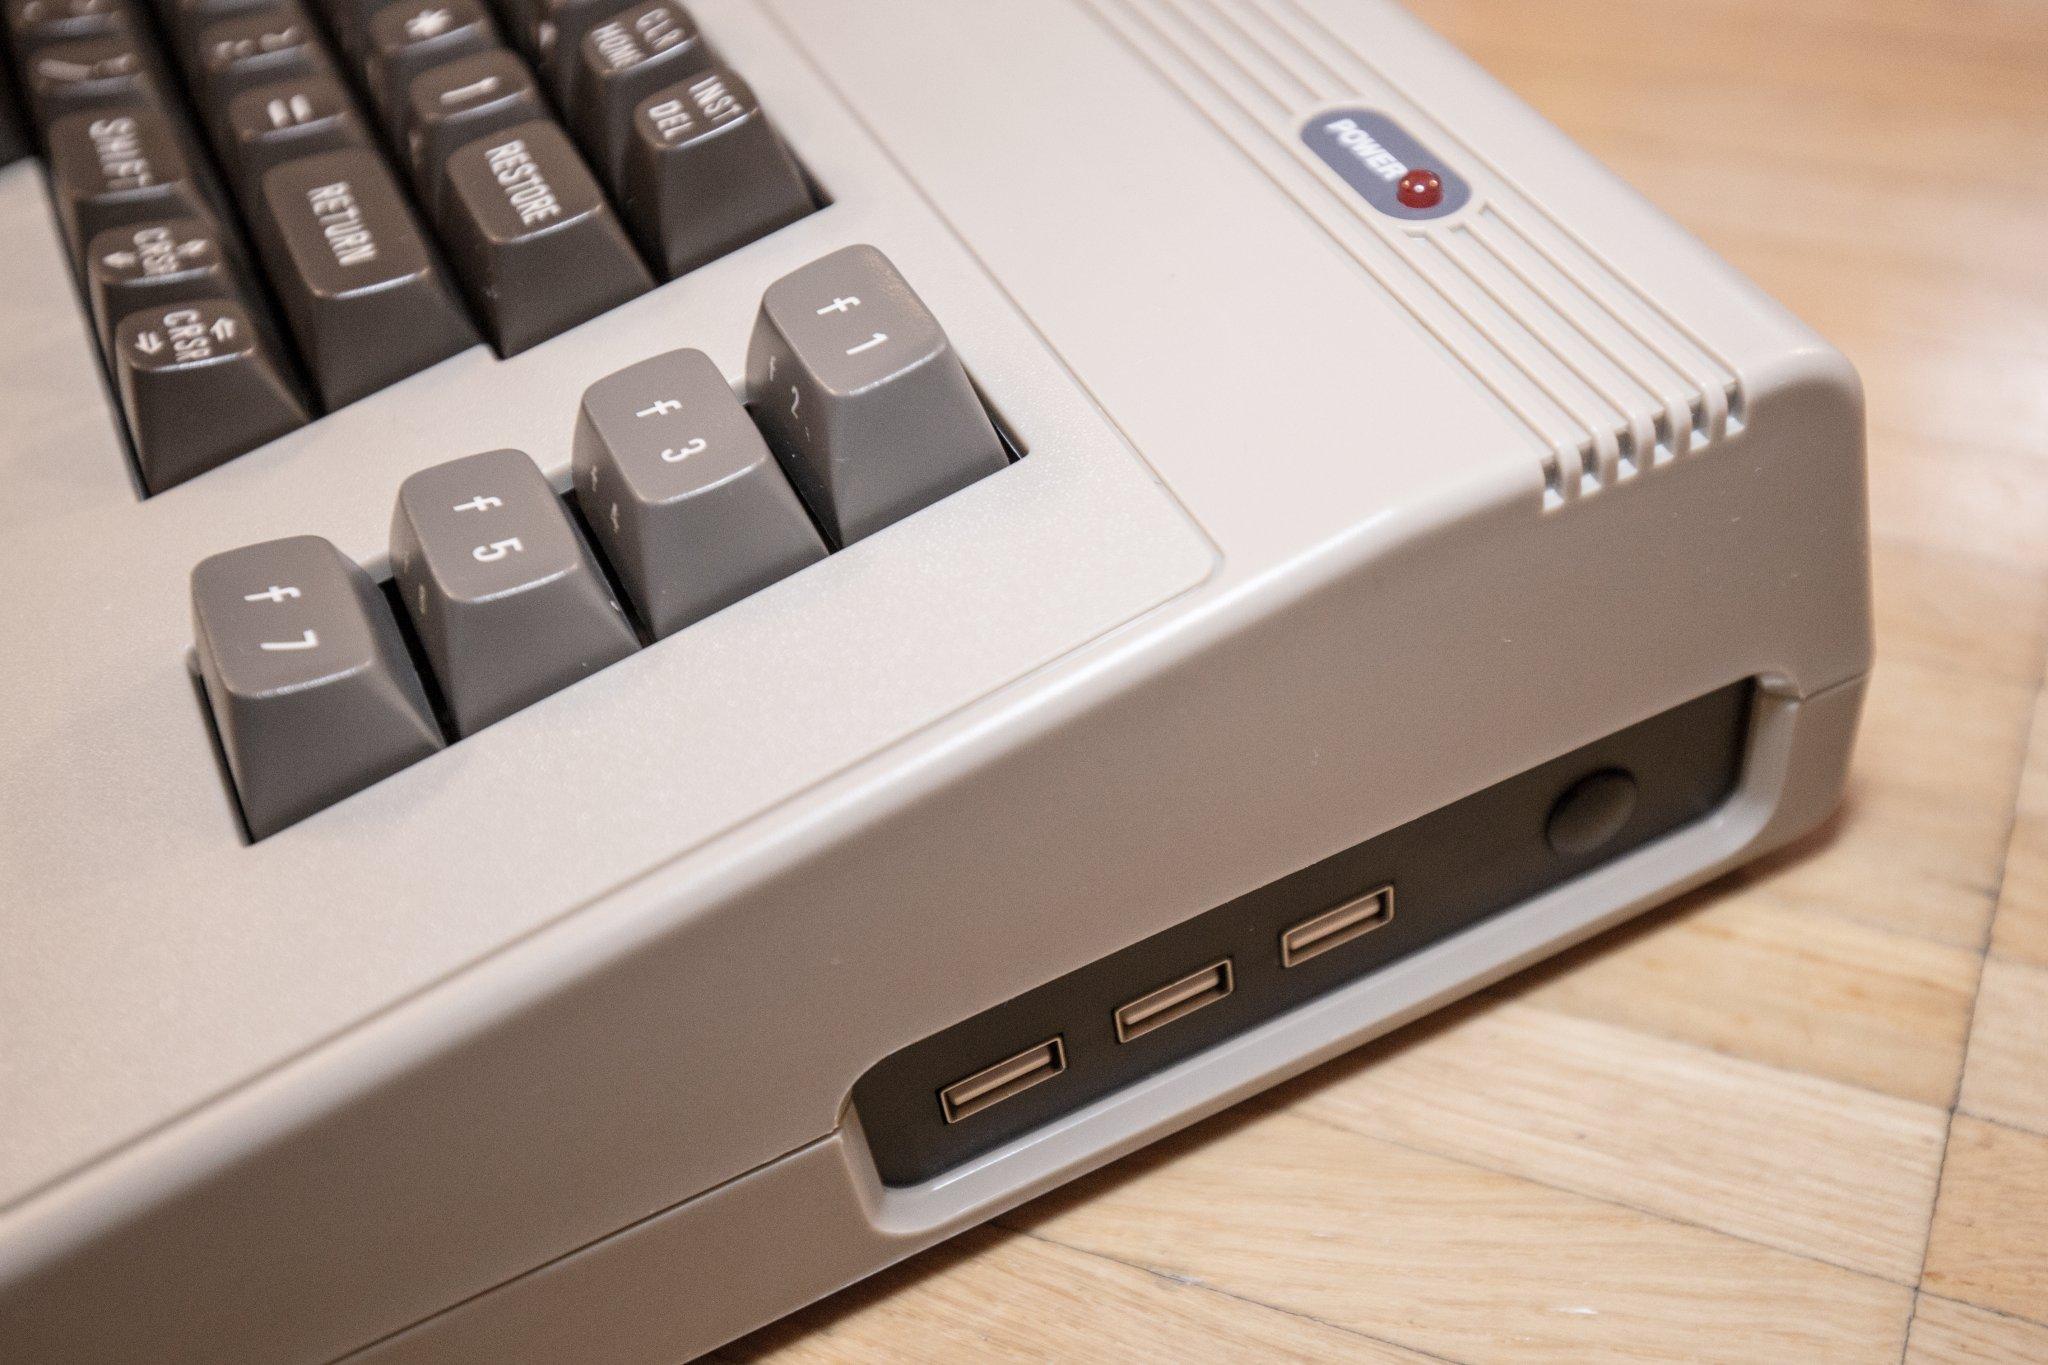 USB Anschlüsse an der Seite